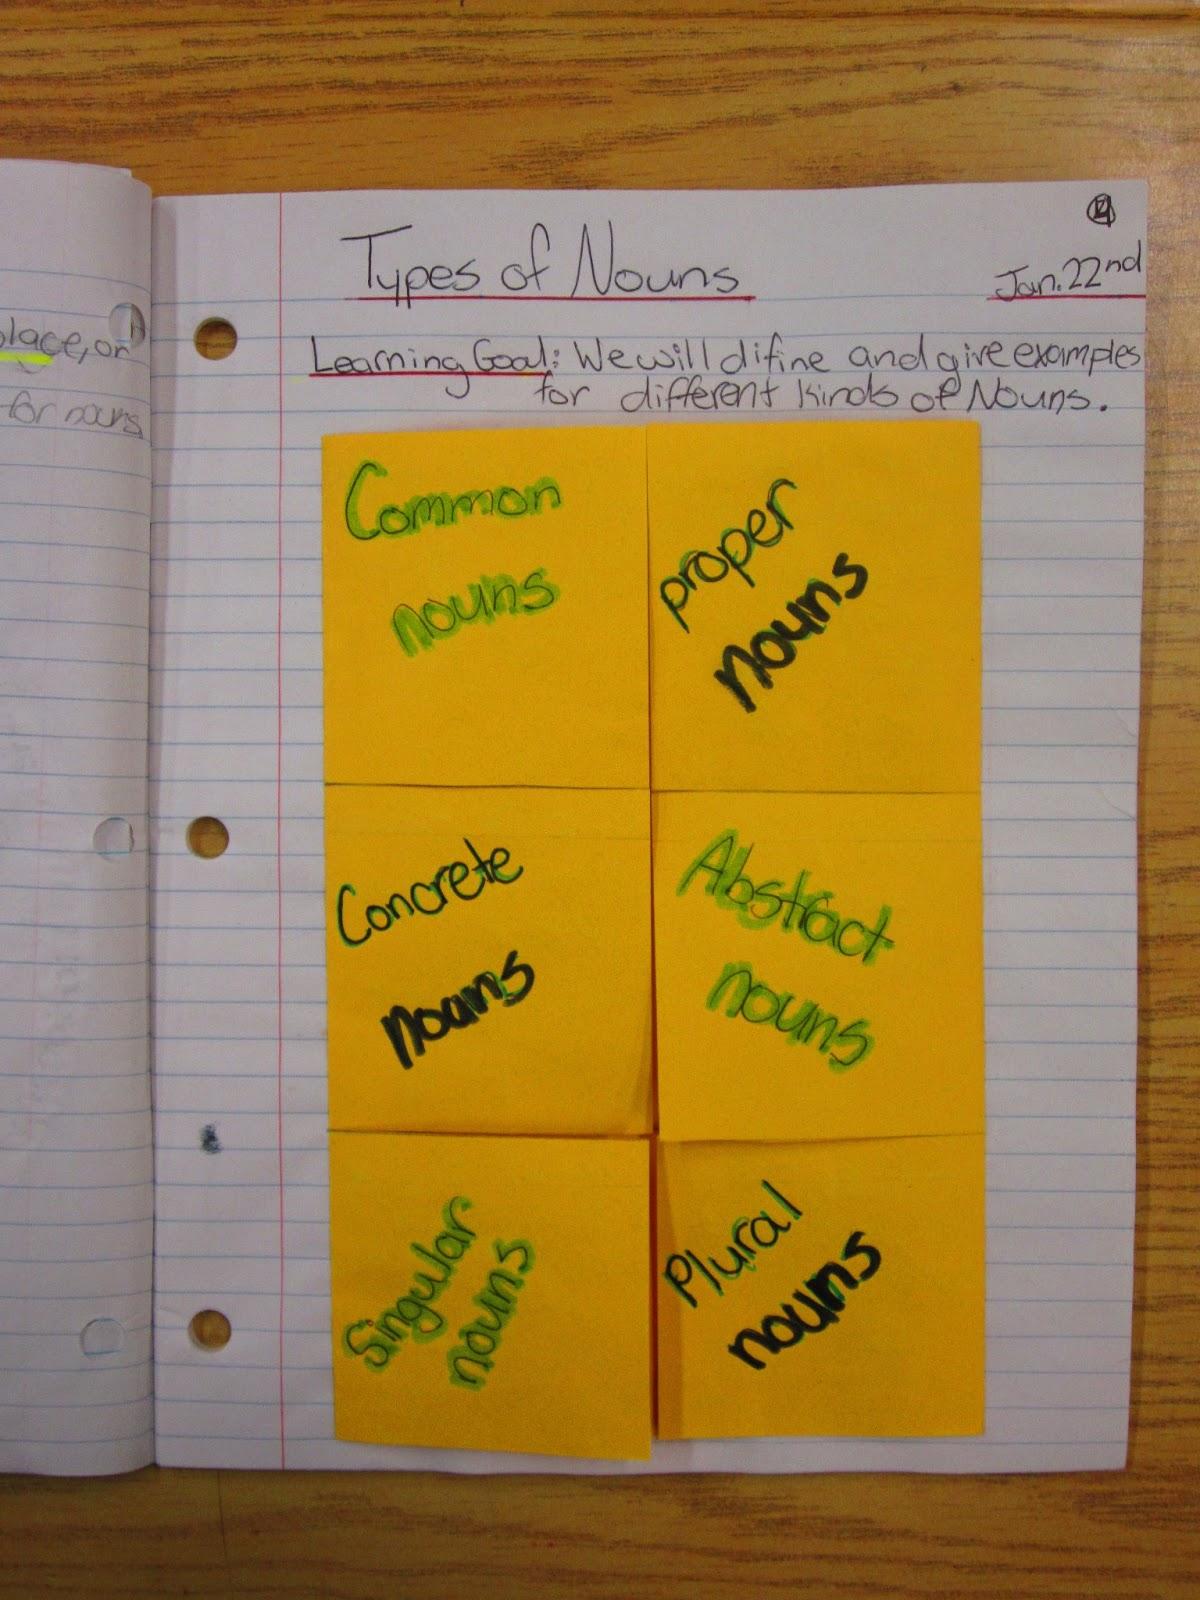 Runde S Room Grammar Talk Tuesdays Nouns And Grammar